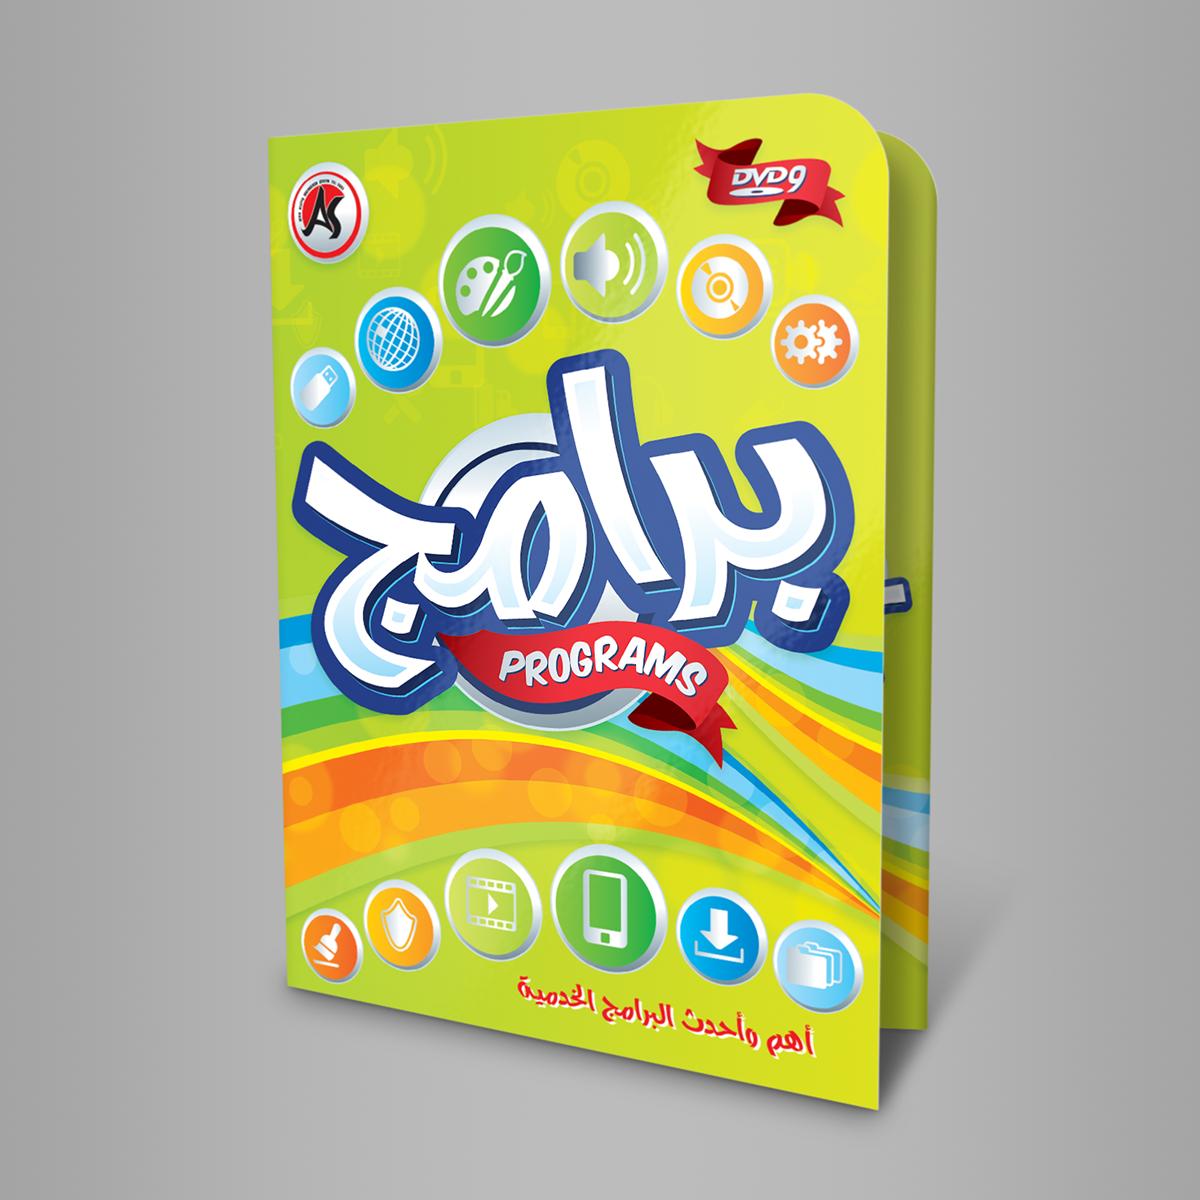 covers DVD software Program game Spiel